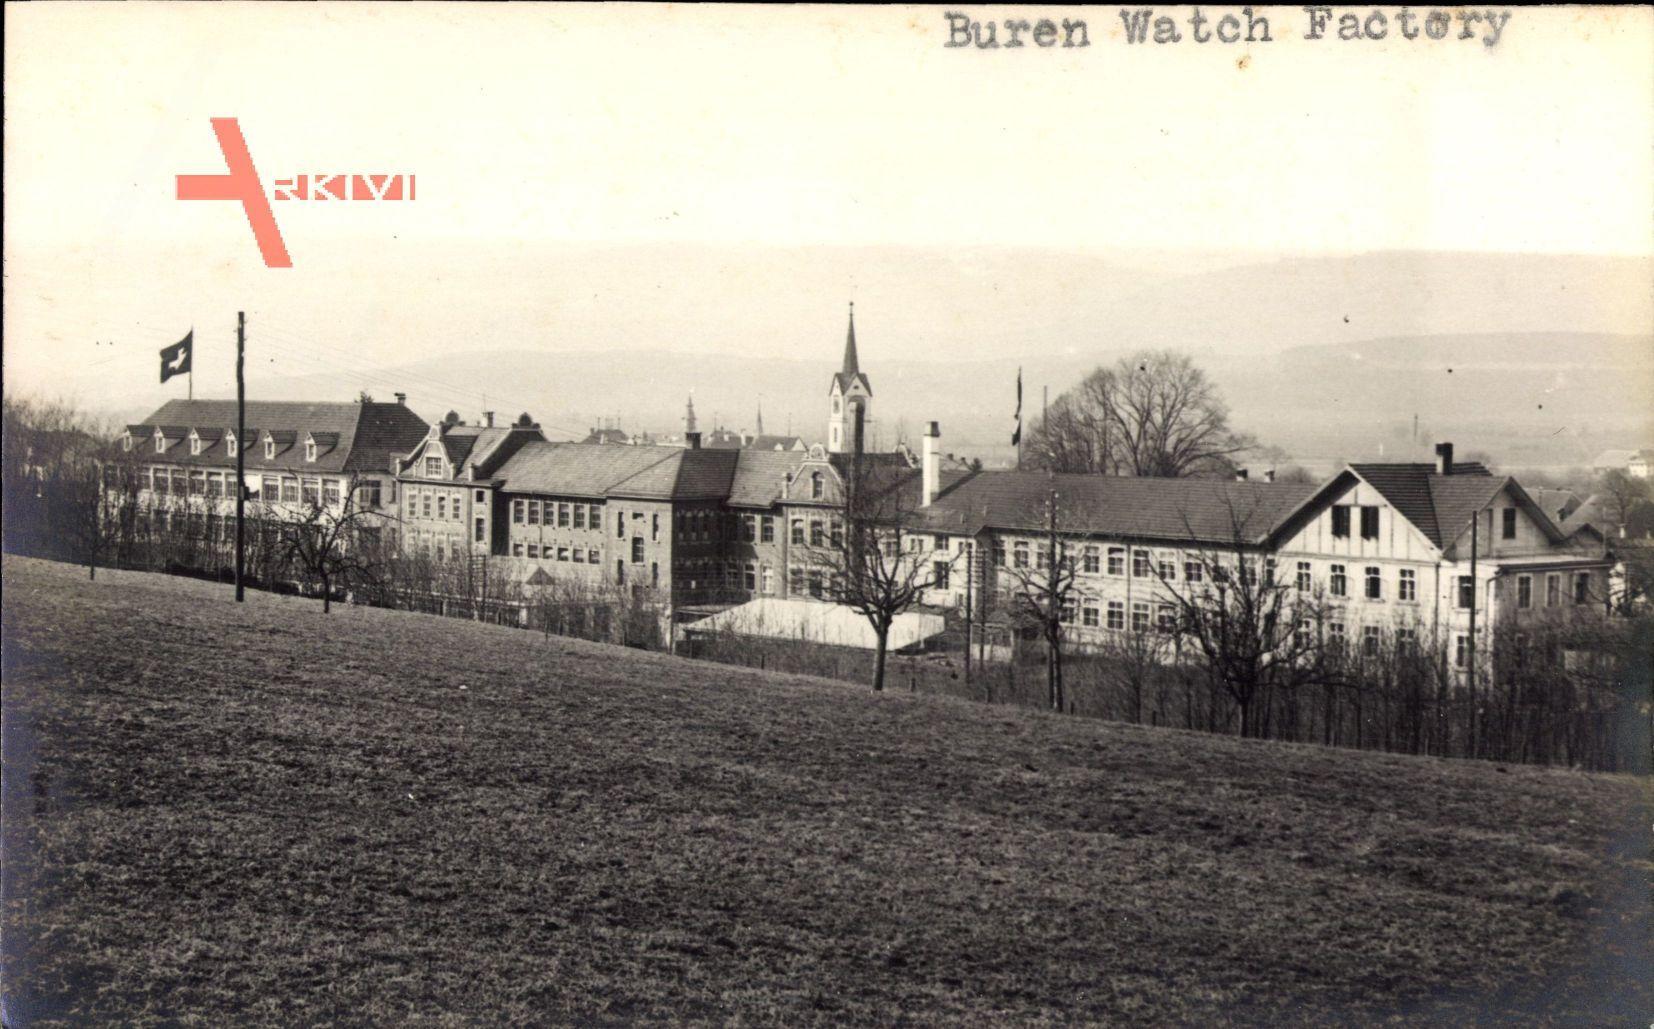 Tavannes Kt. Bern Schweiz, Buren Watch Factory, Uhrenfabrik